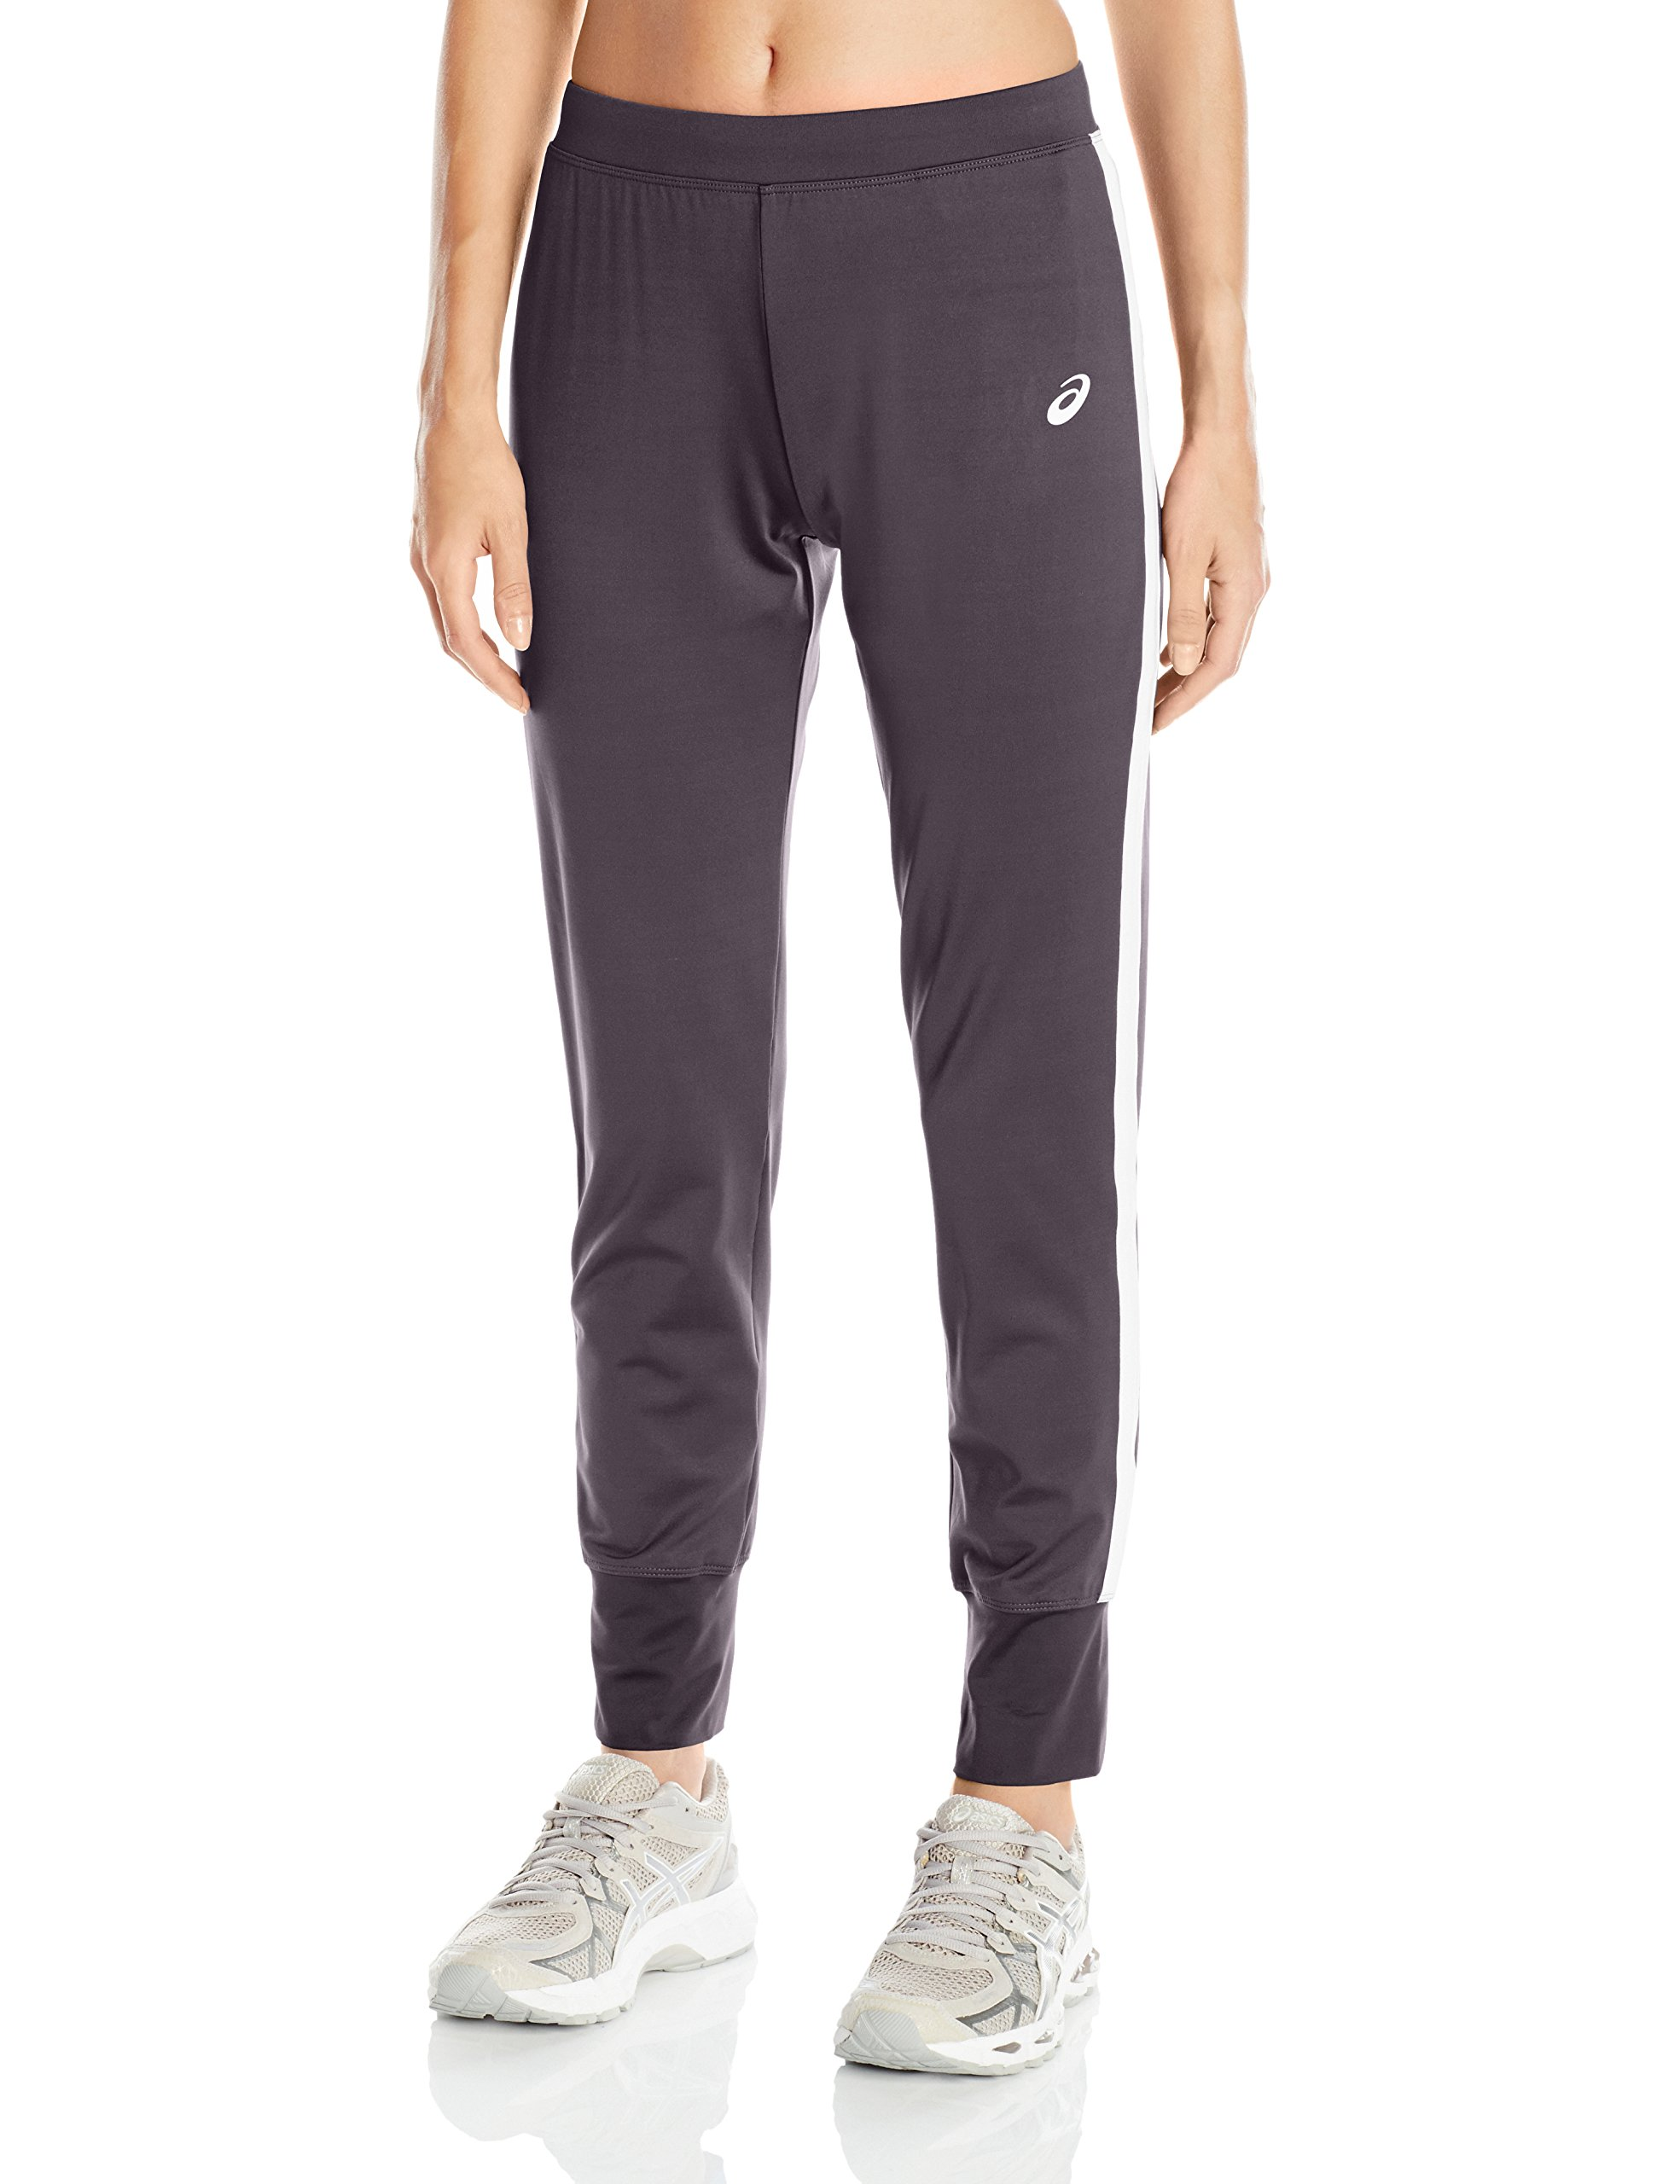 ASICS Women's Lani Performance Pant, Steel Grey/White, X-Small